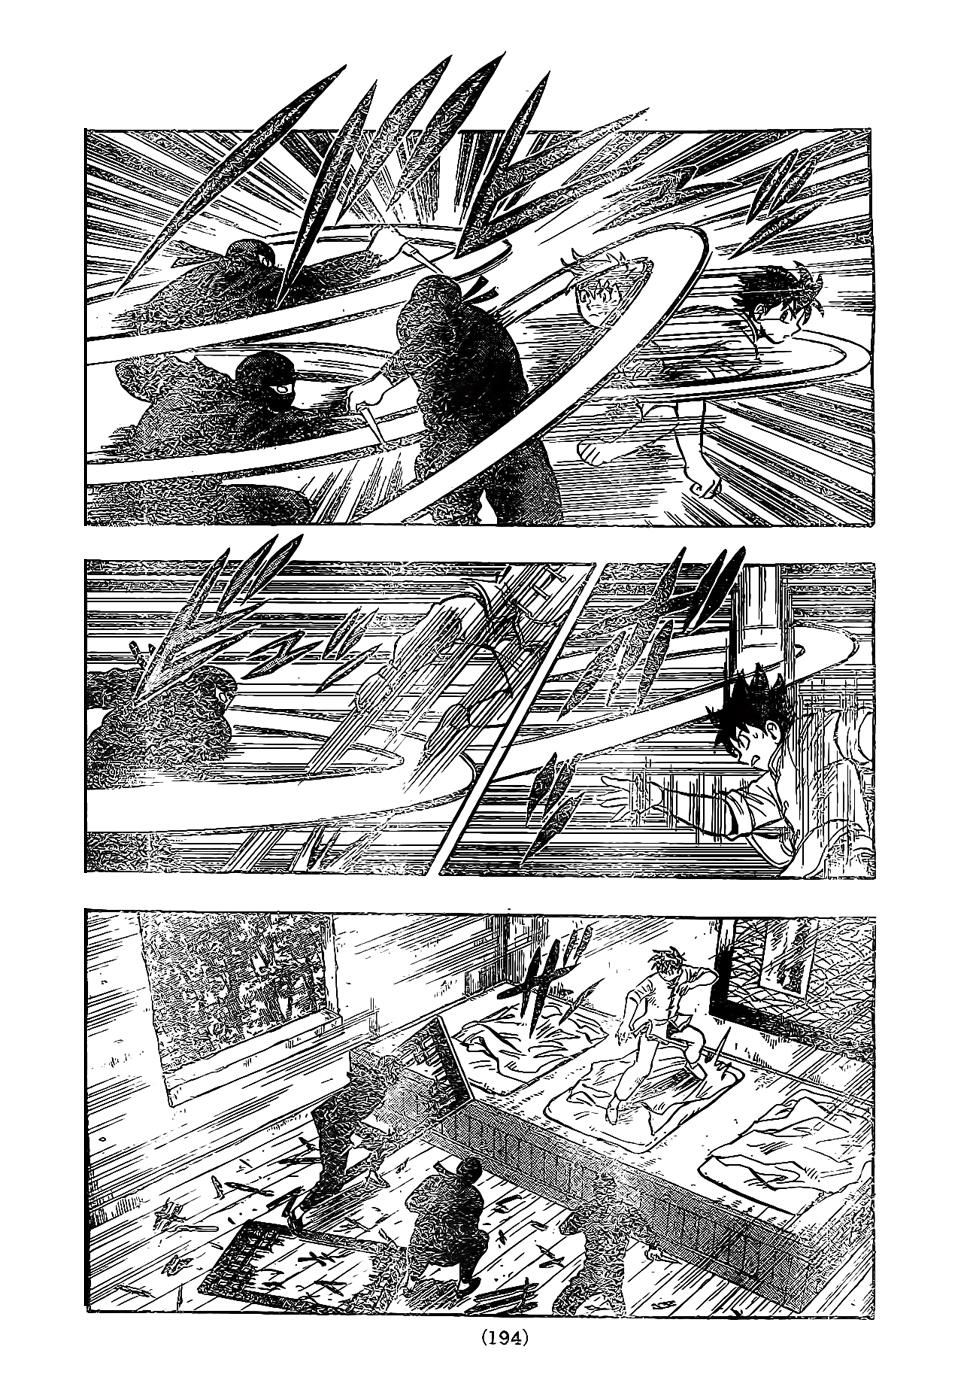 Hoàng Phi Hồng Phần 4 chap 84 Trang 8